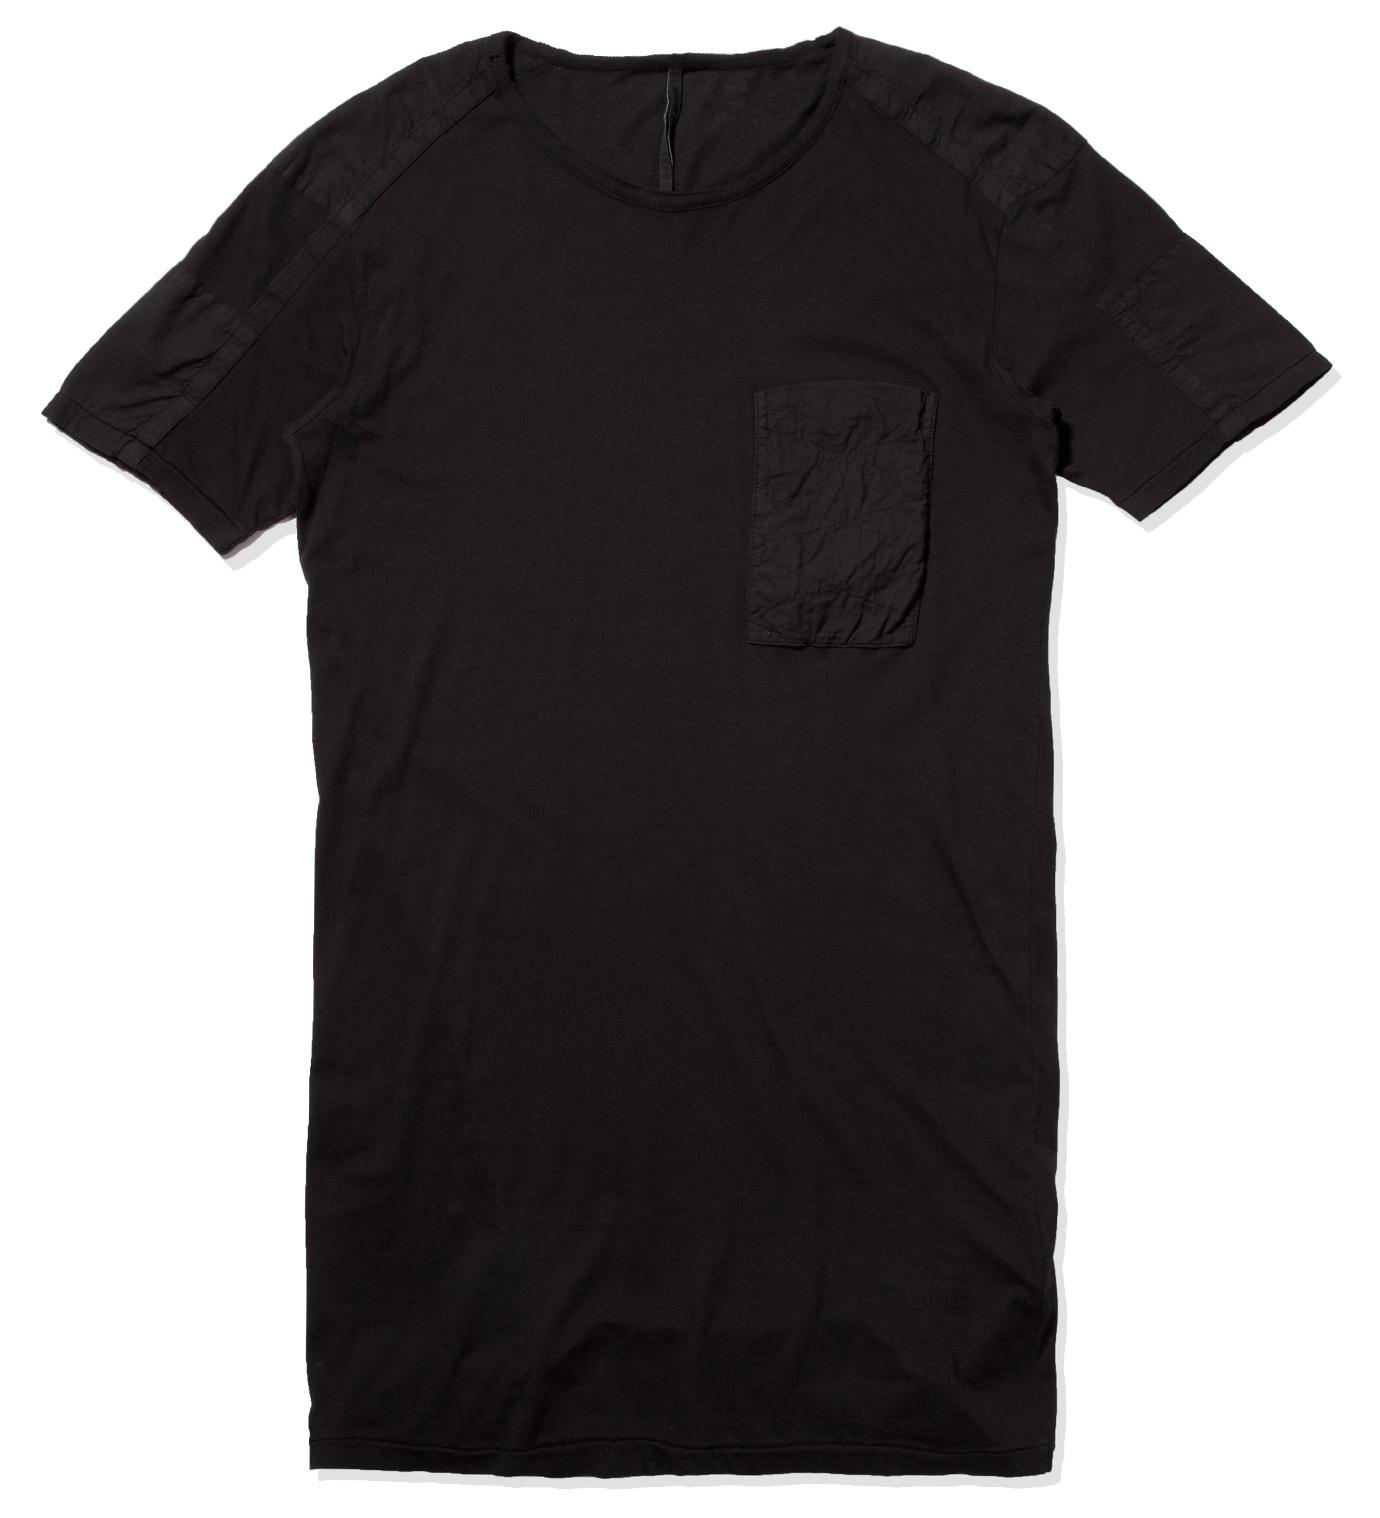 SILENT DAMIR DOMA Black Tetro MNS Patchwork T-Shirt